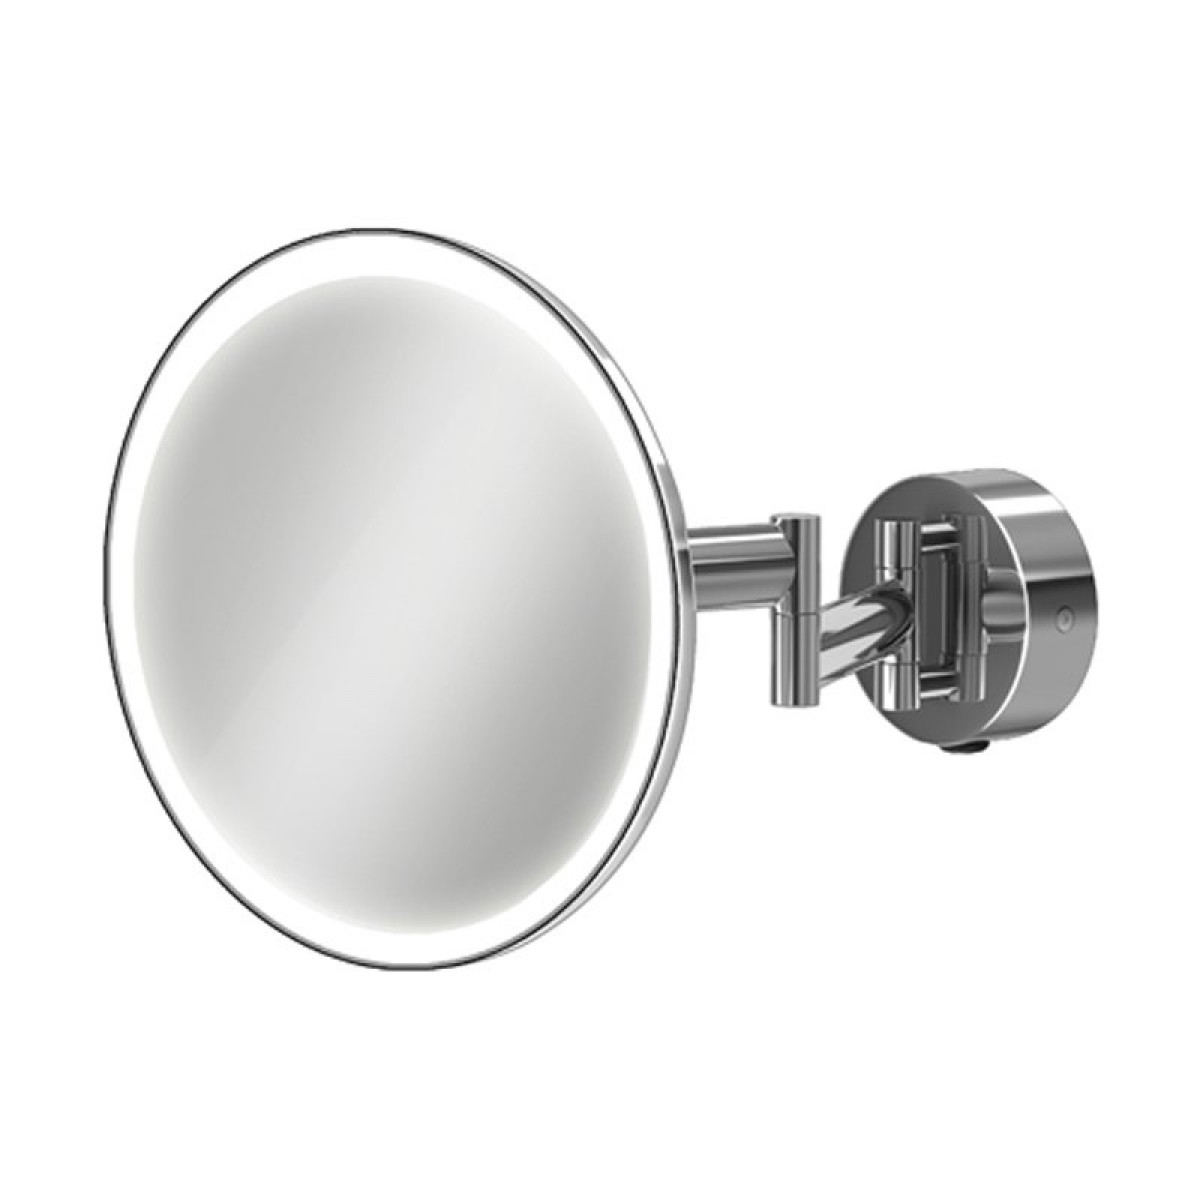 Hib Eclipse Round Led Magnifying Mirror 21100